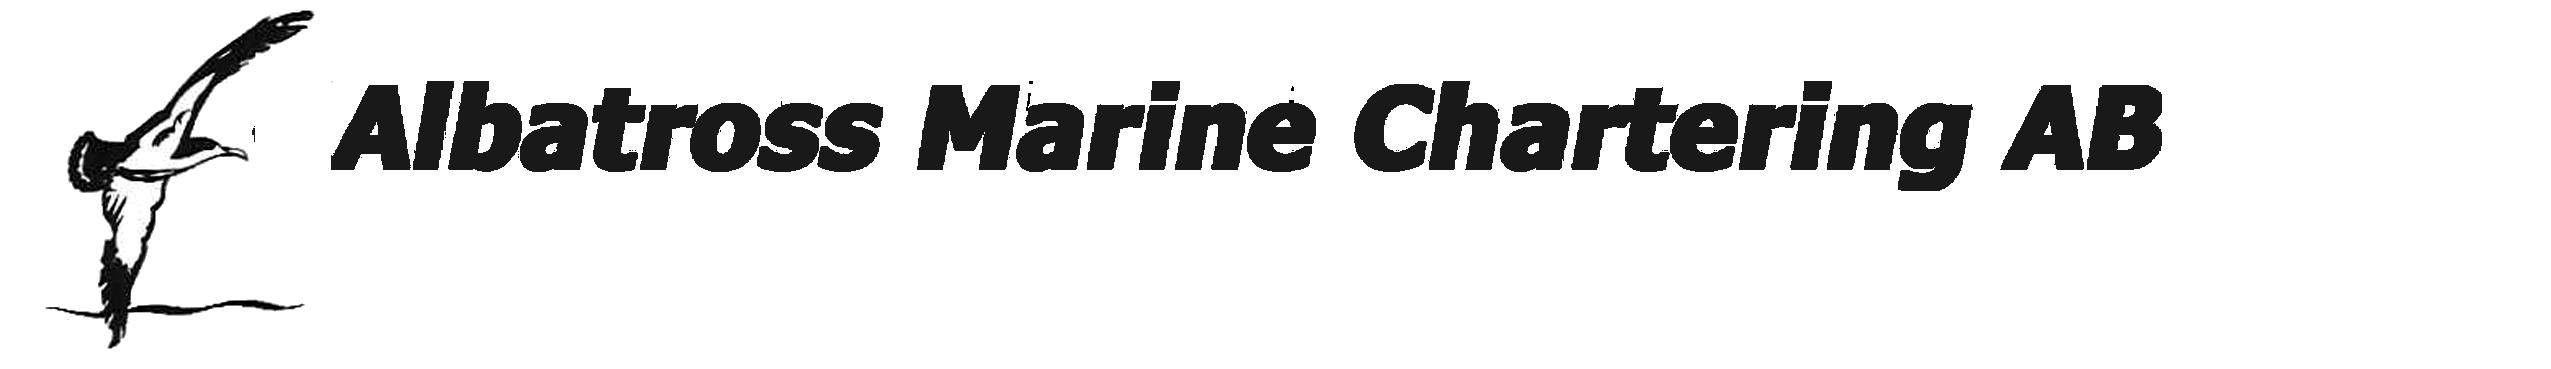 Albatross Marine Chartering AB